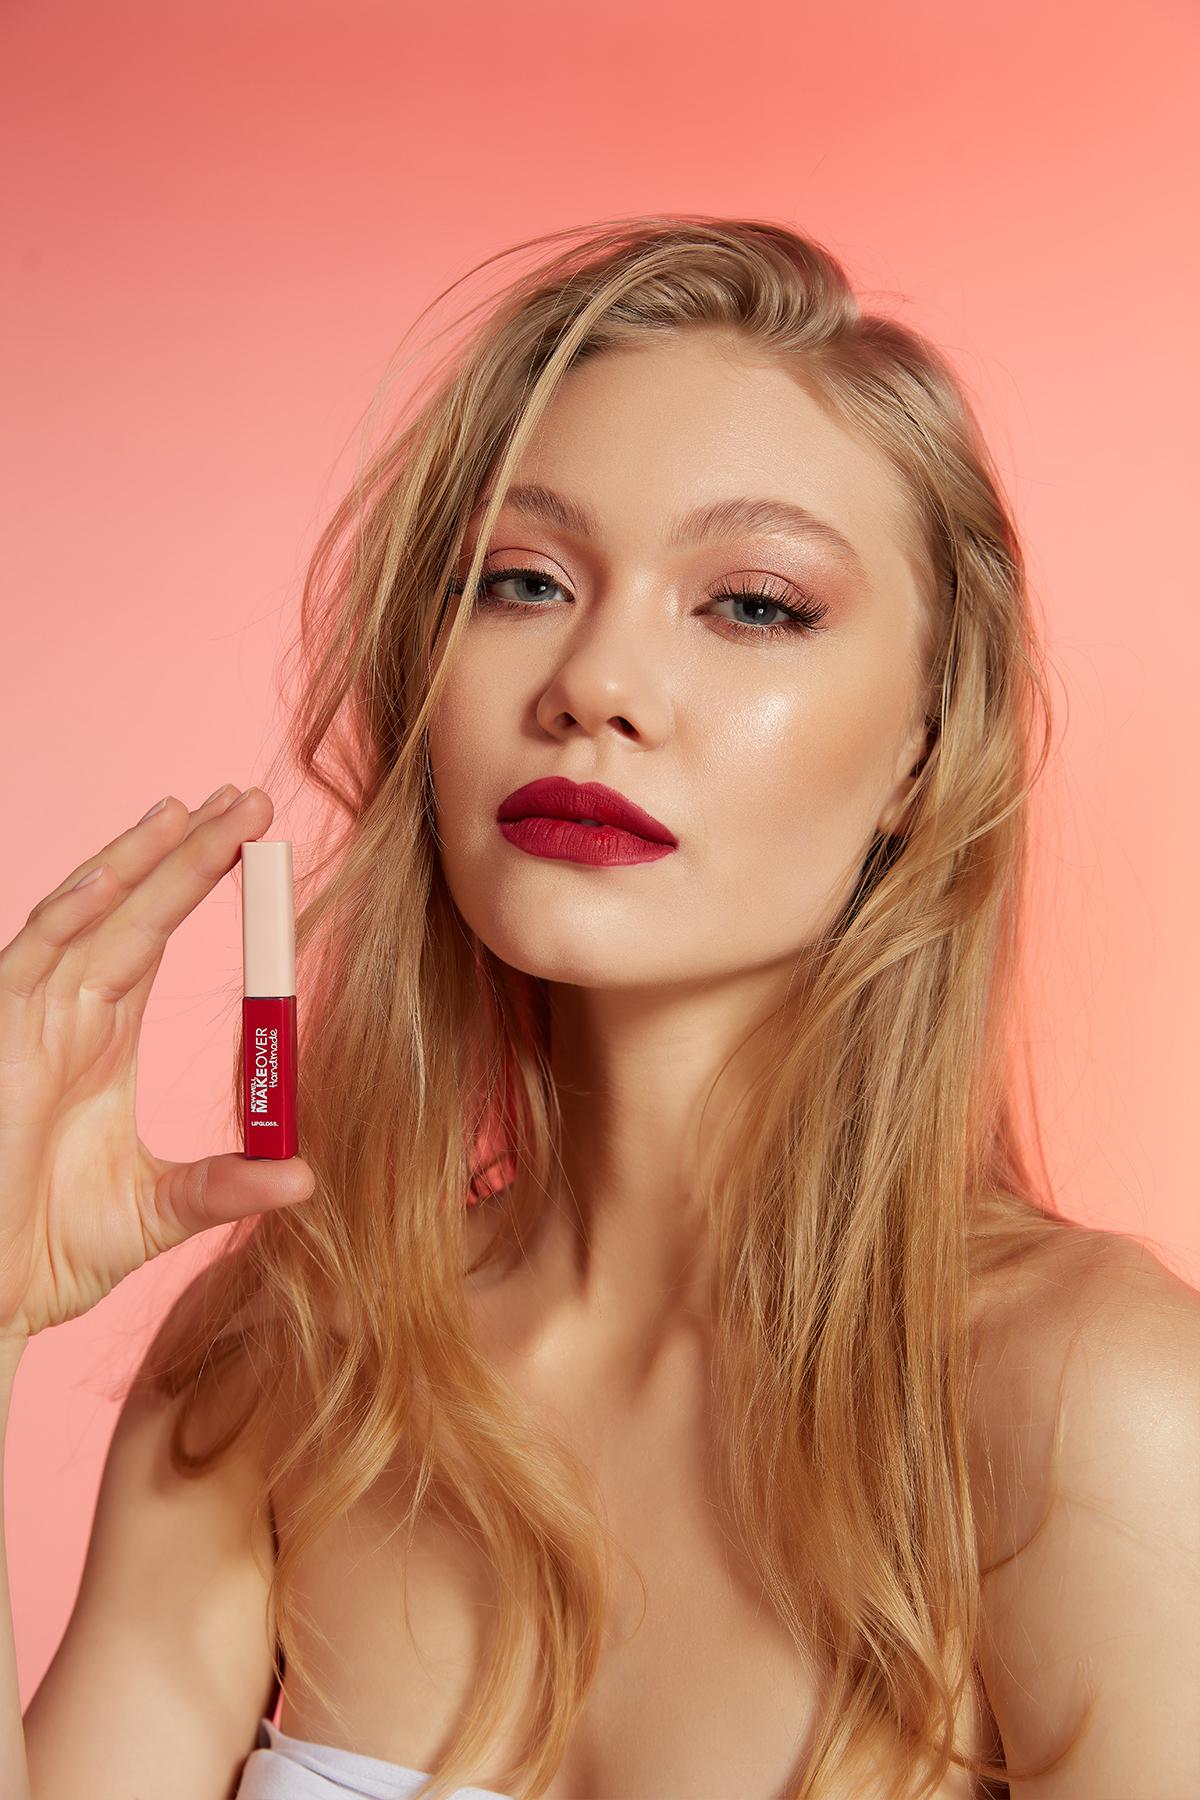 Makeover Handmade 2'li Liquid Lipstick - Paradise - 4ml -Ruj - Lipstick